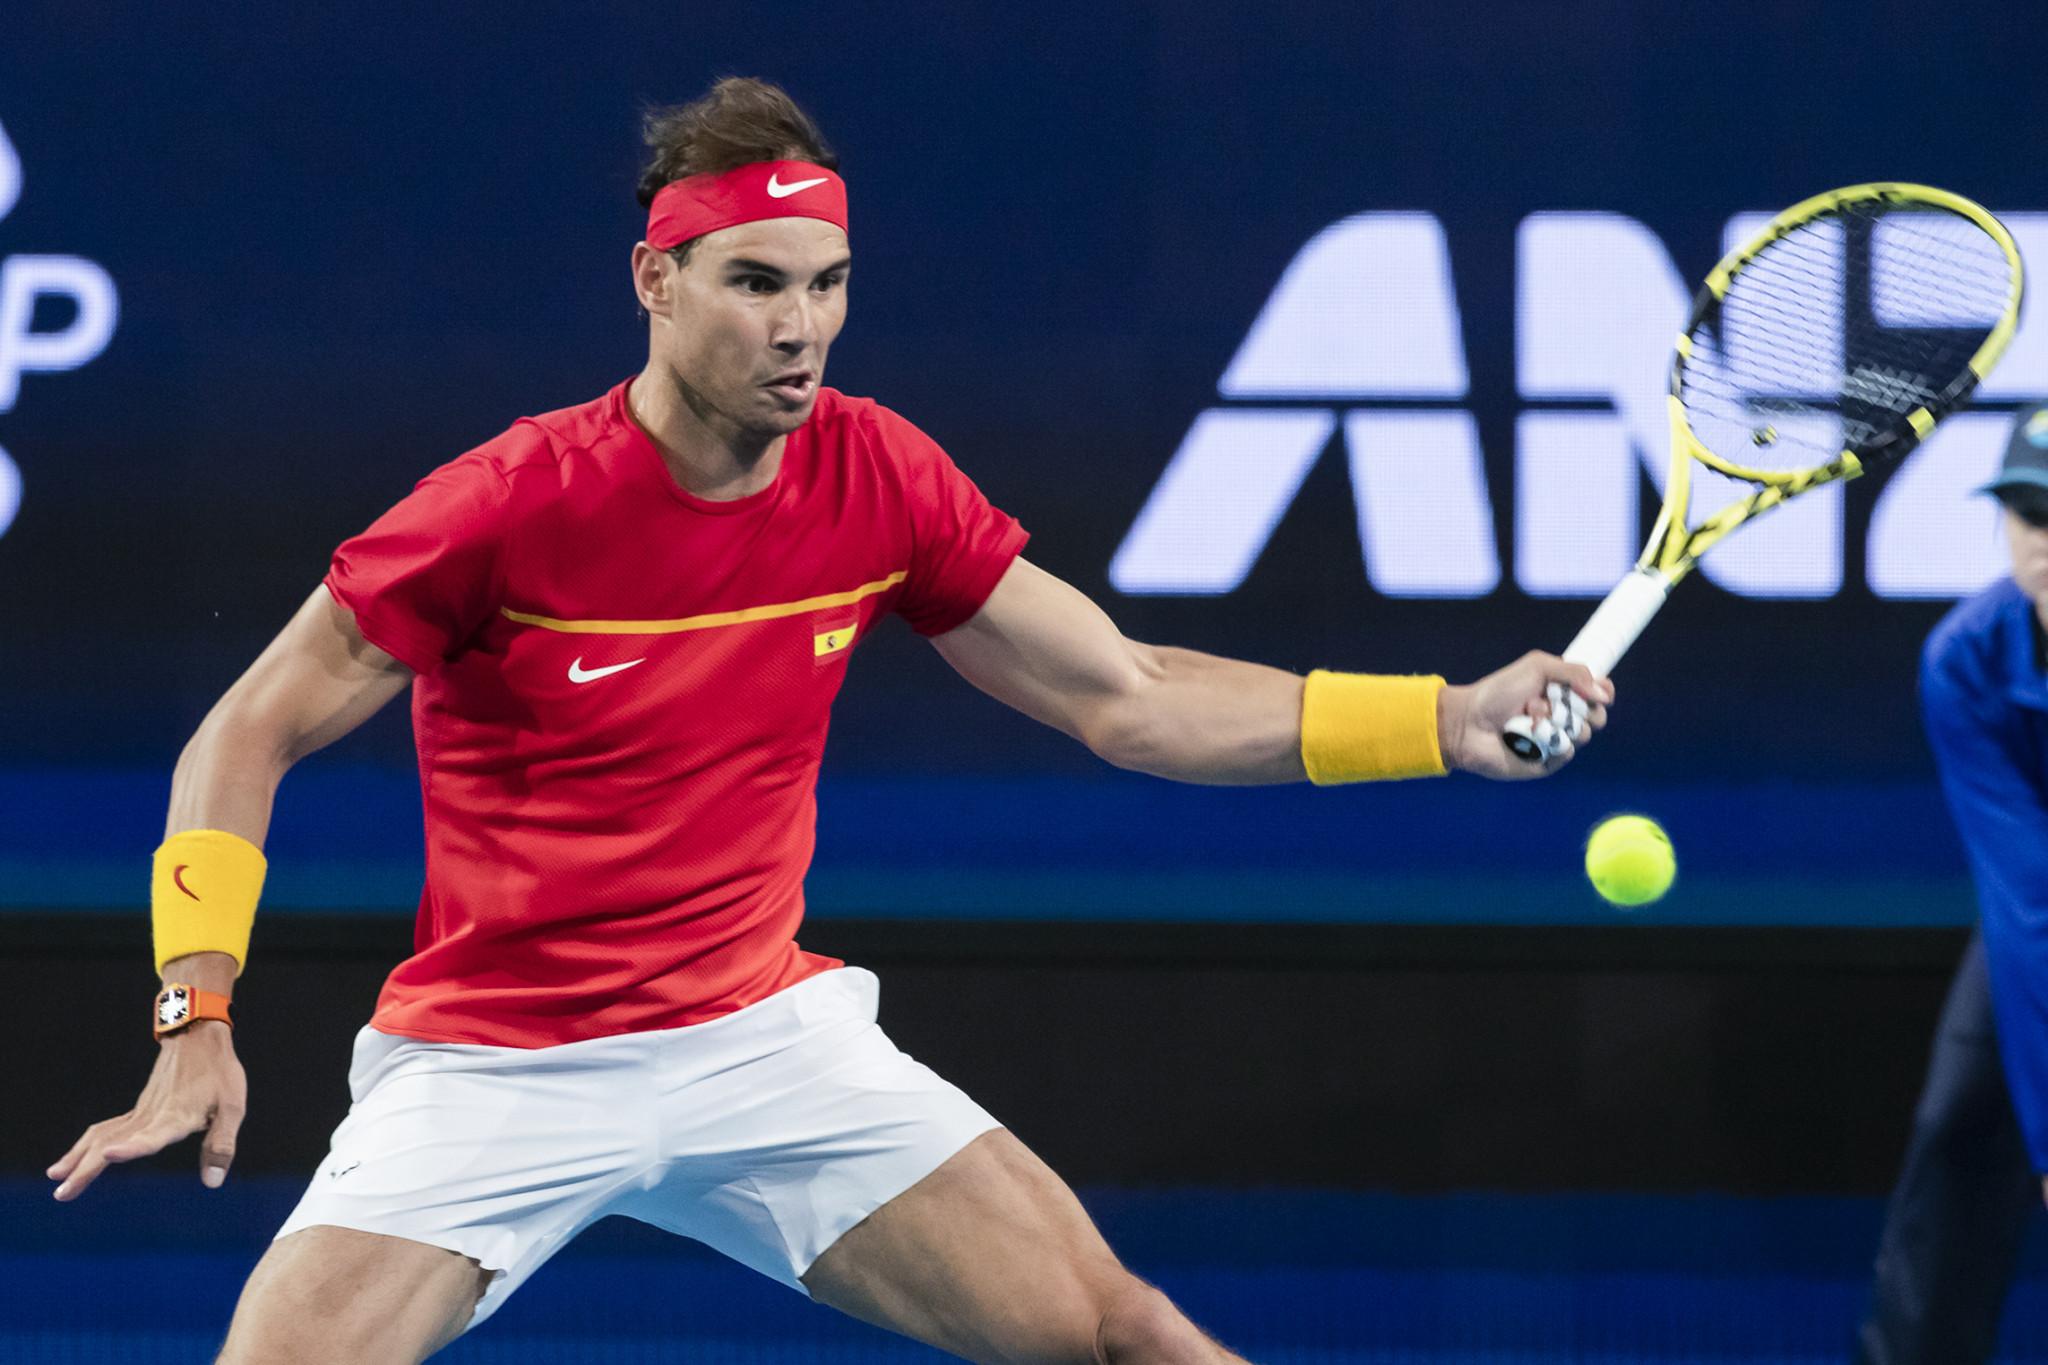 Rafael Nadal beat Nikoloz Basilashvili to seal Spain's victory over Georgia ©Getty Images